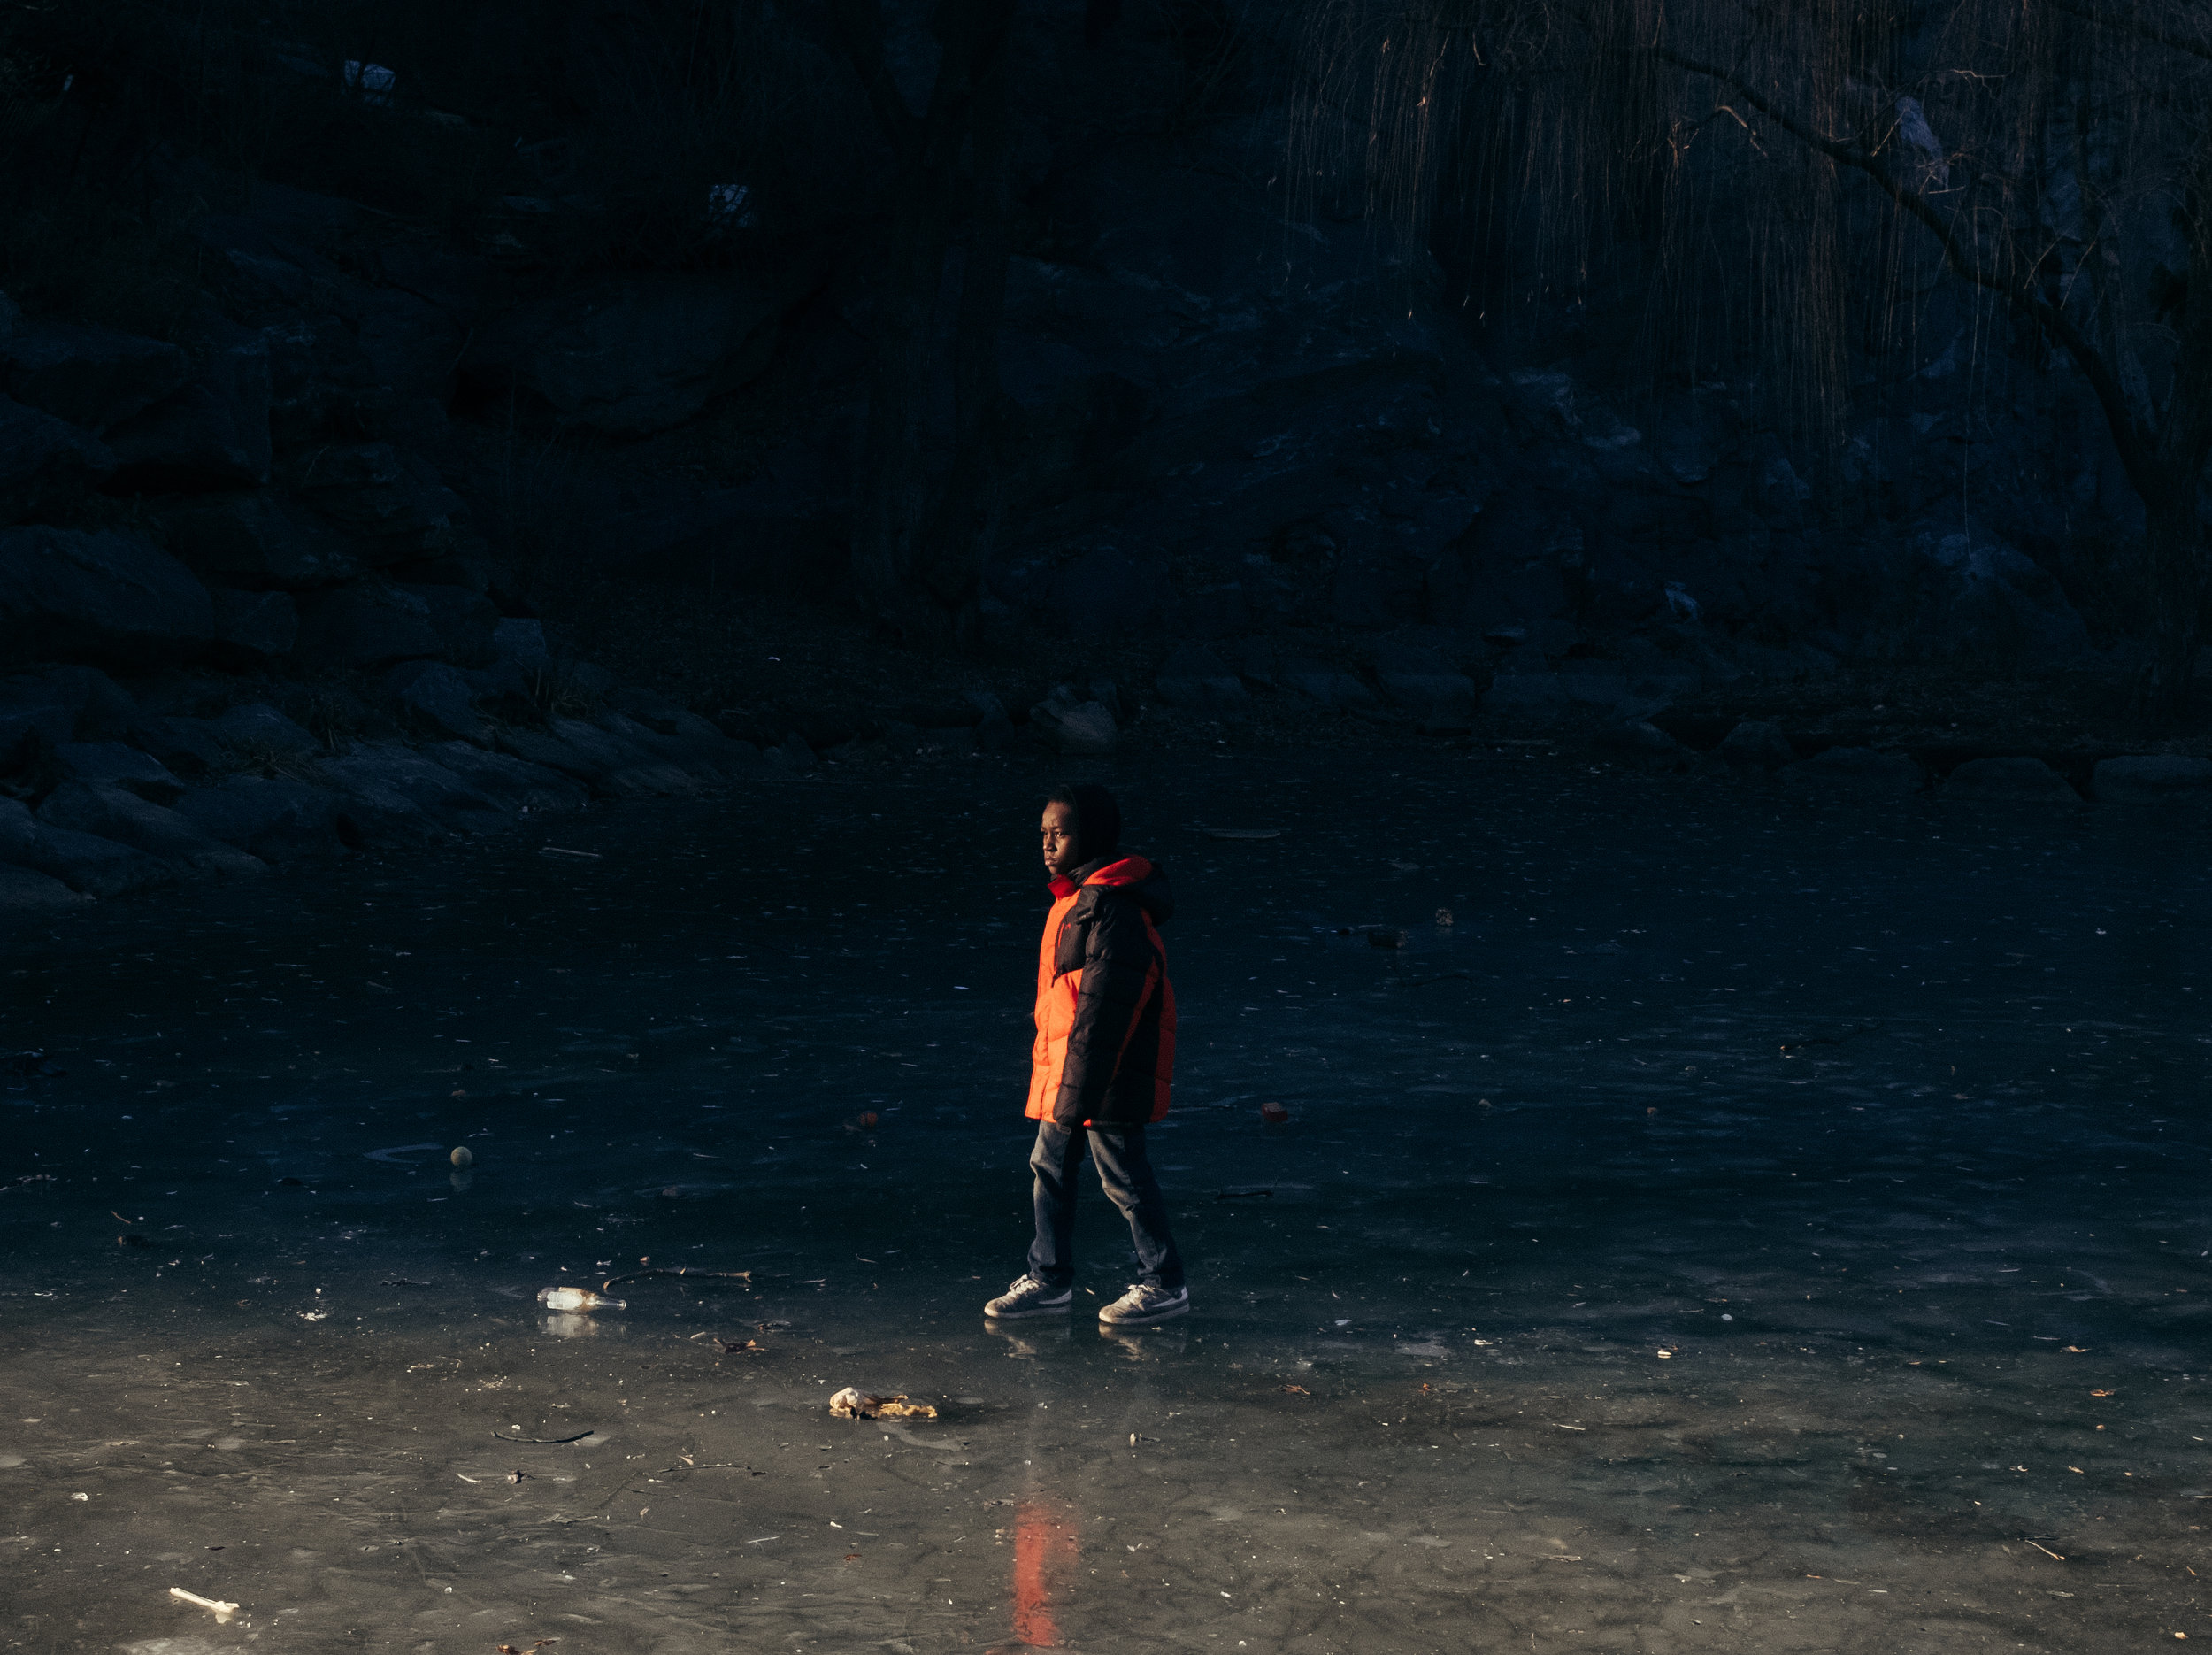 Kid on frozen lake, Harlem, New York